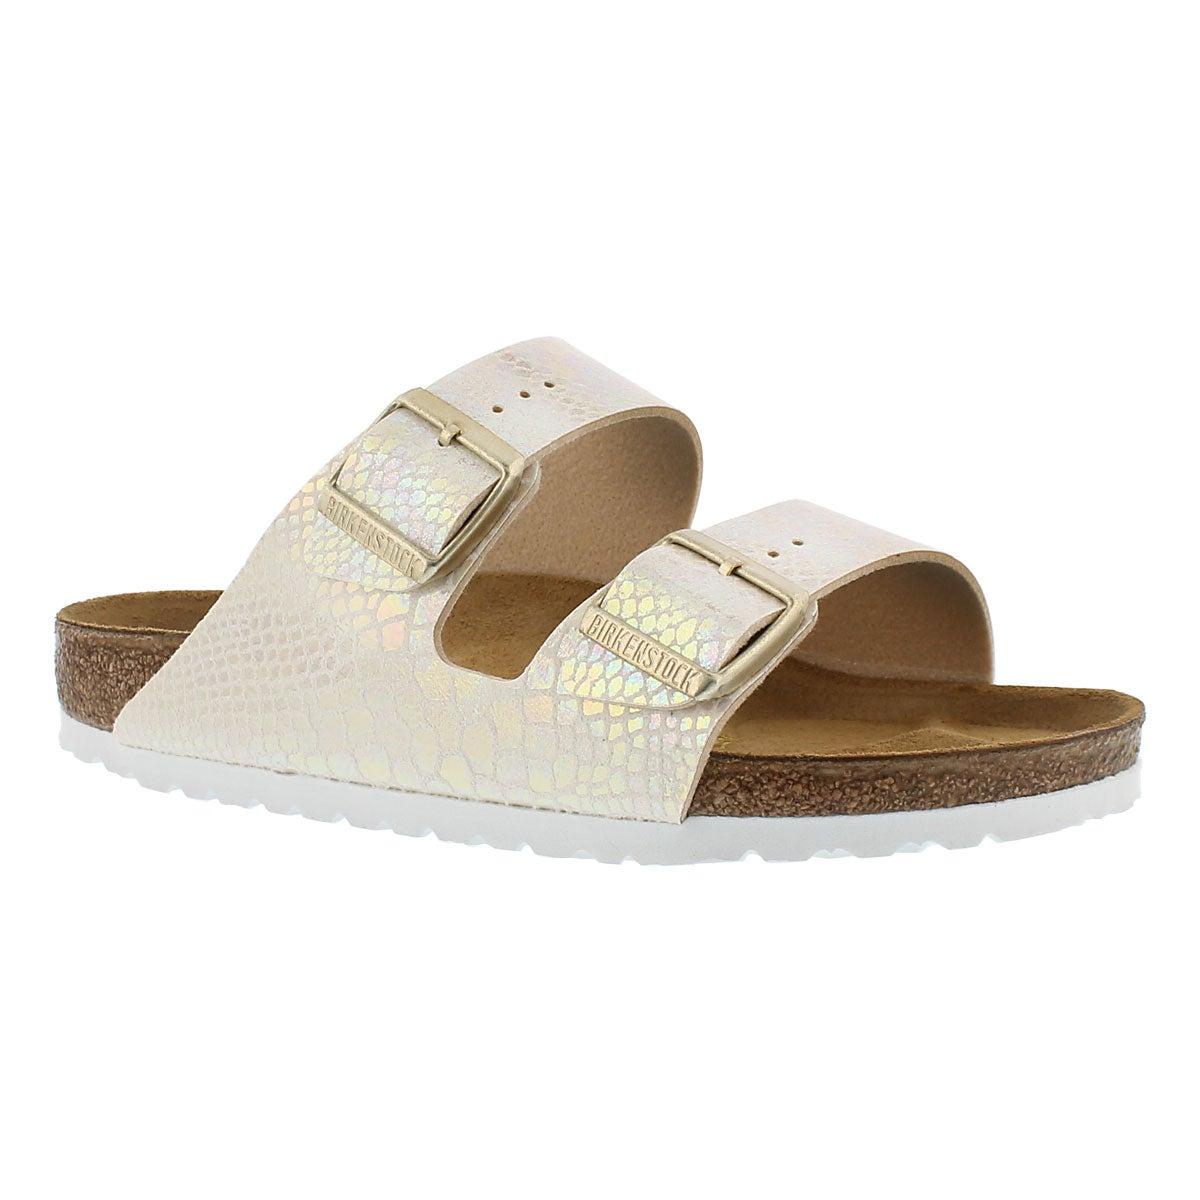 Lds Arizona shiny snake cream BF sandal